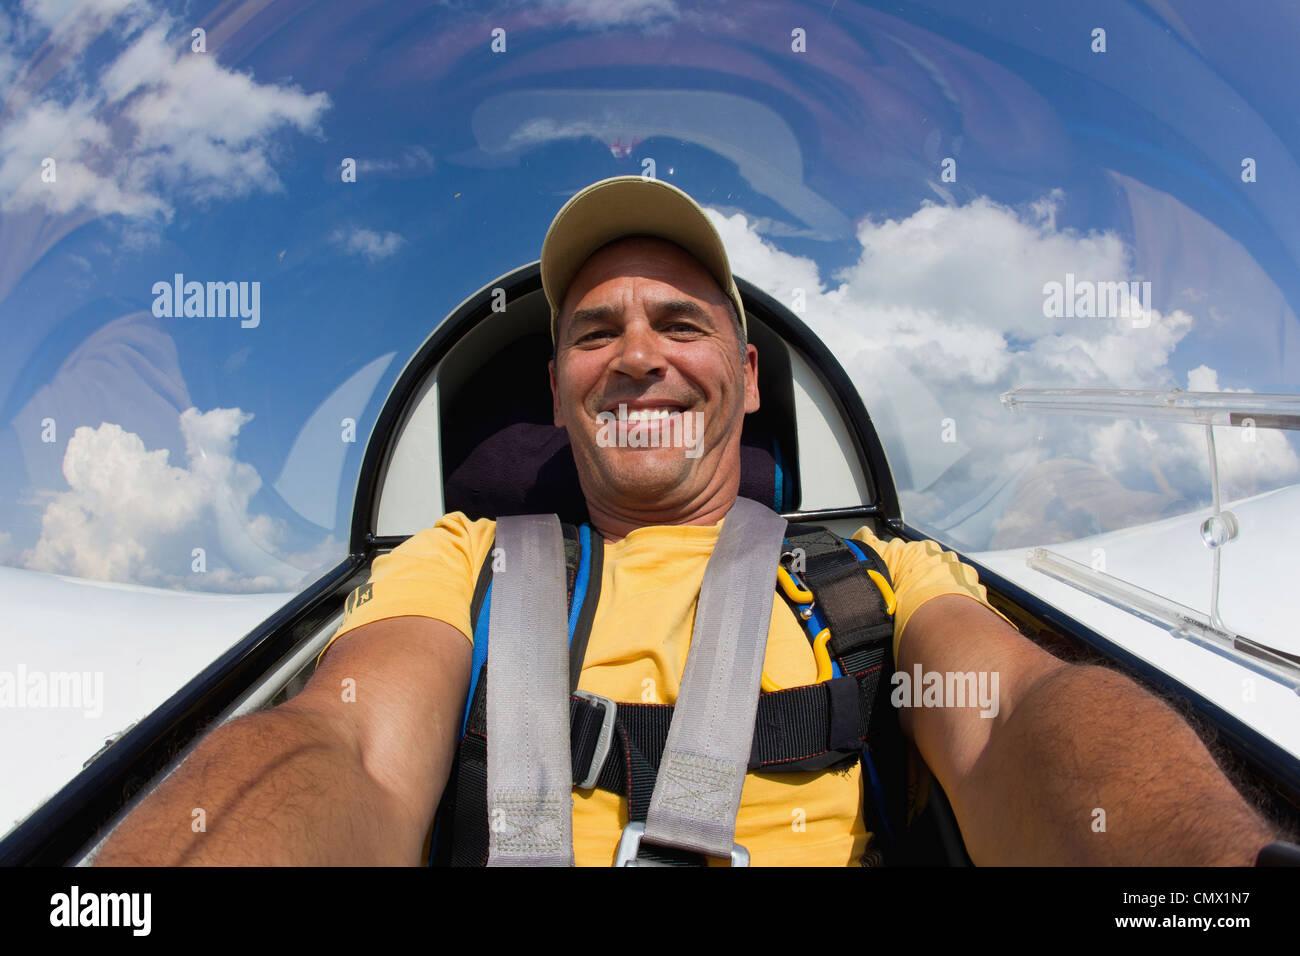 Germany, Bavaria, Bad Toelz, Mature man in glider, smiling, portrait - Stock Image